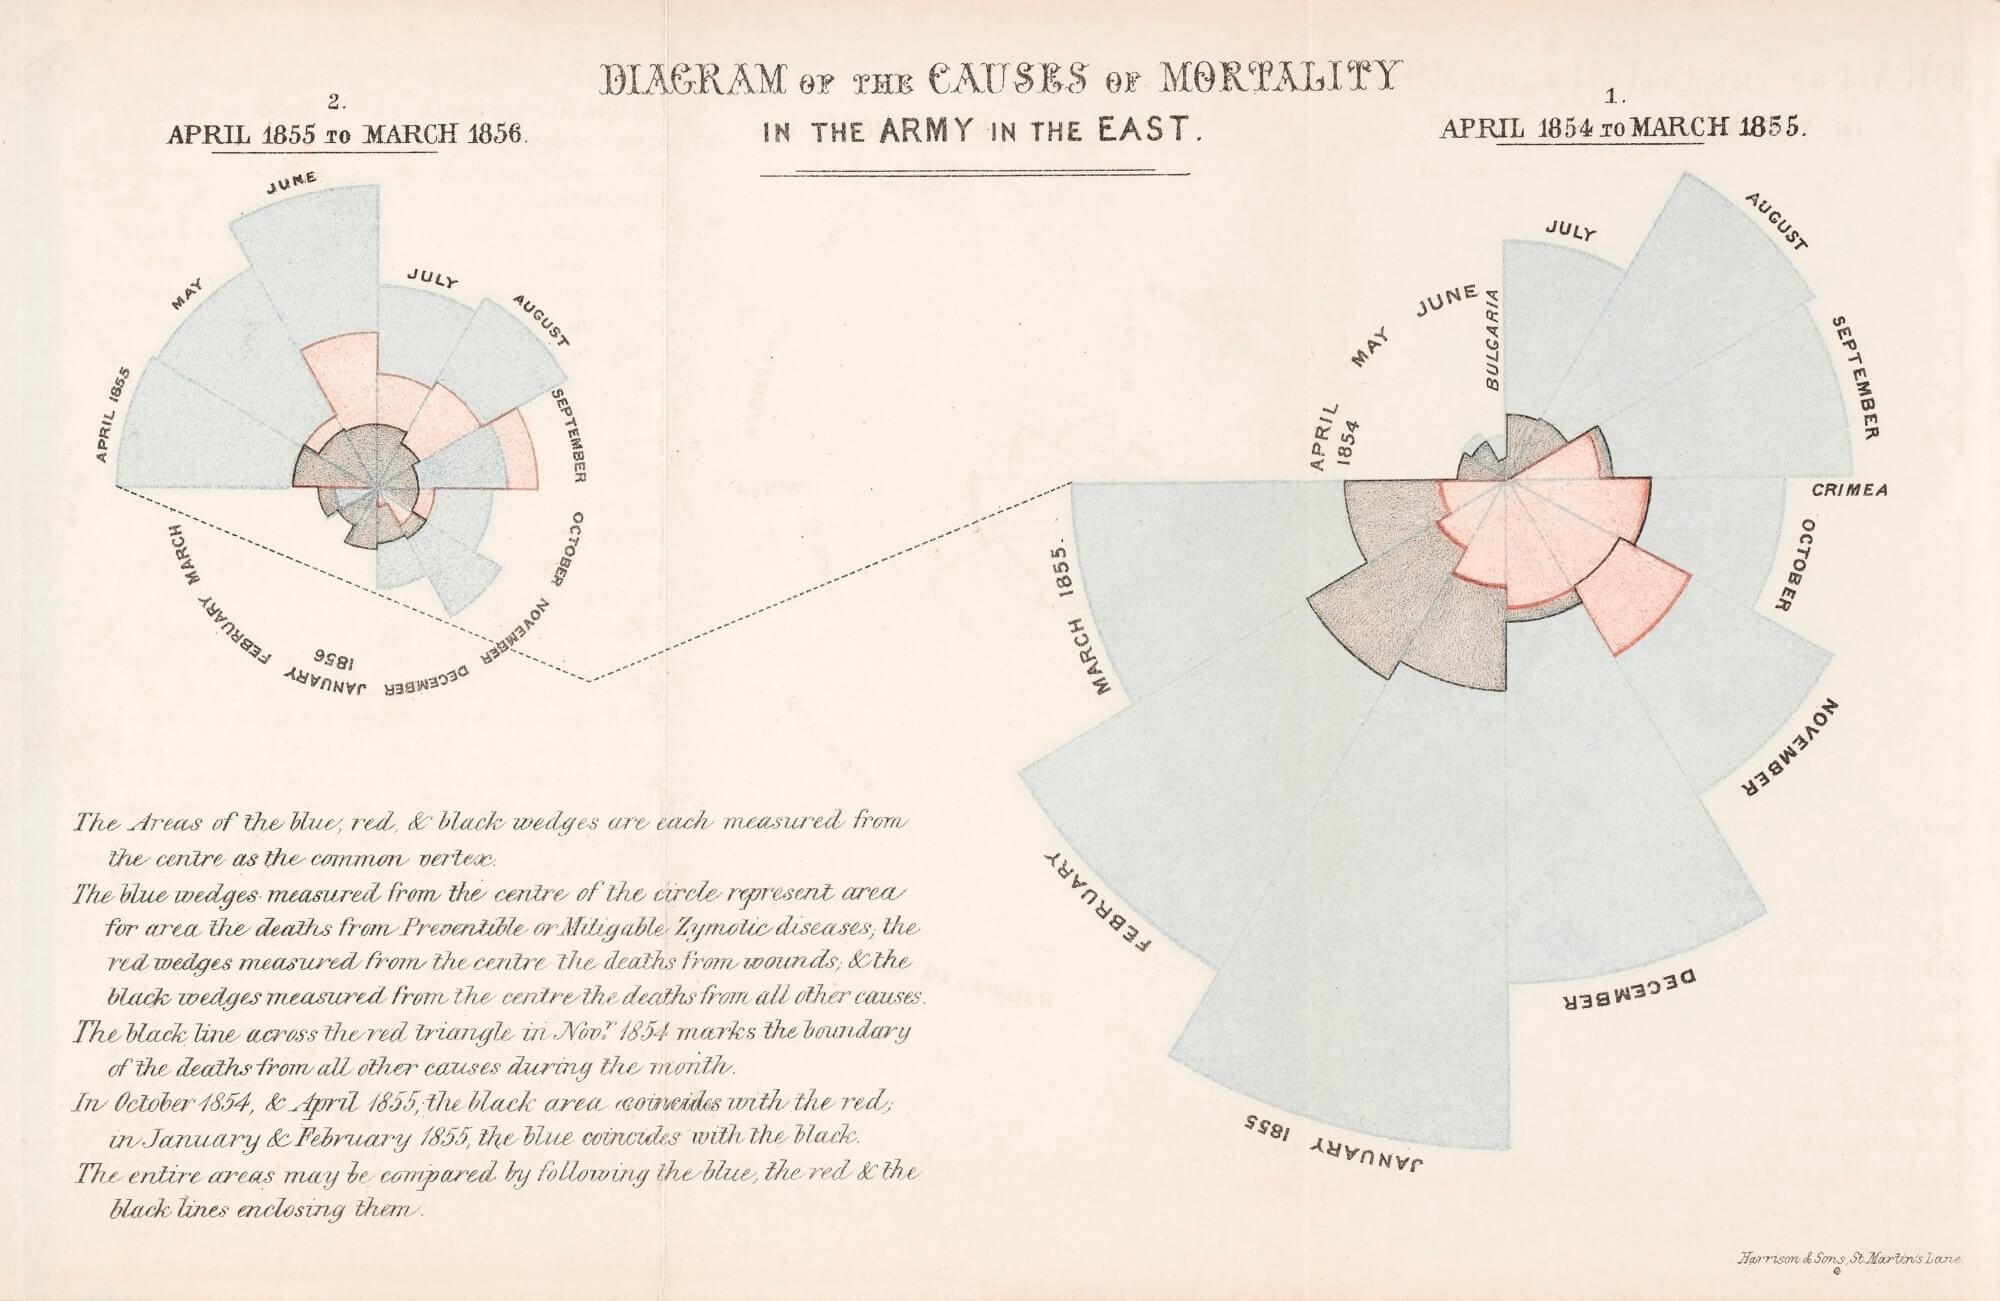 florence nightingale data analysis